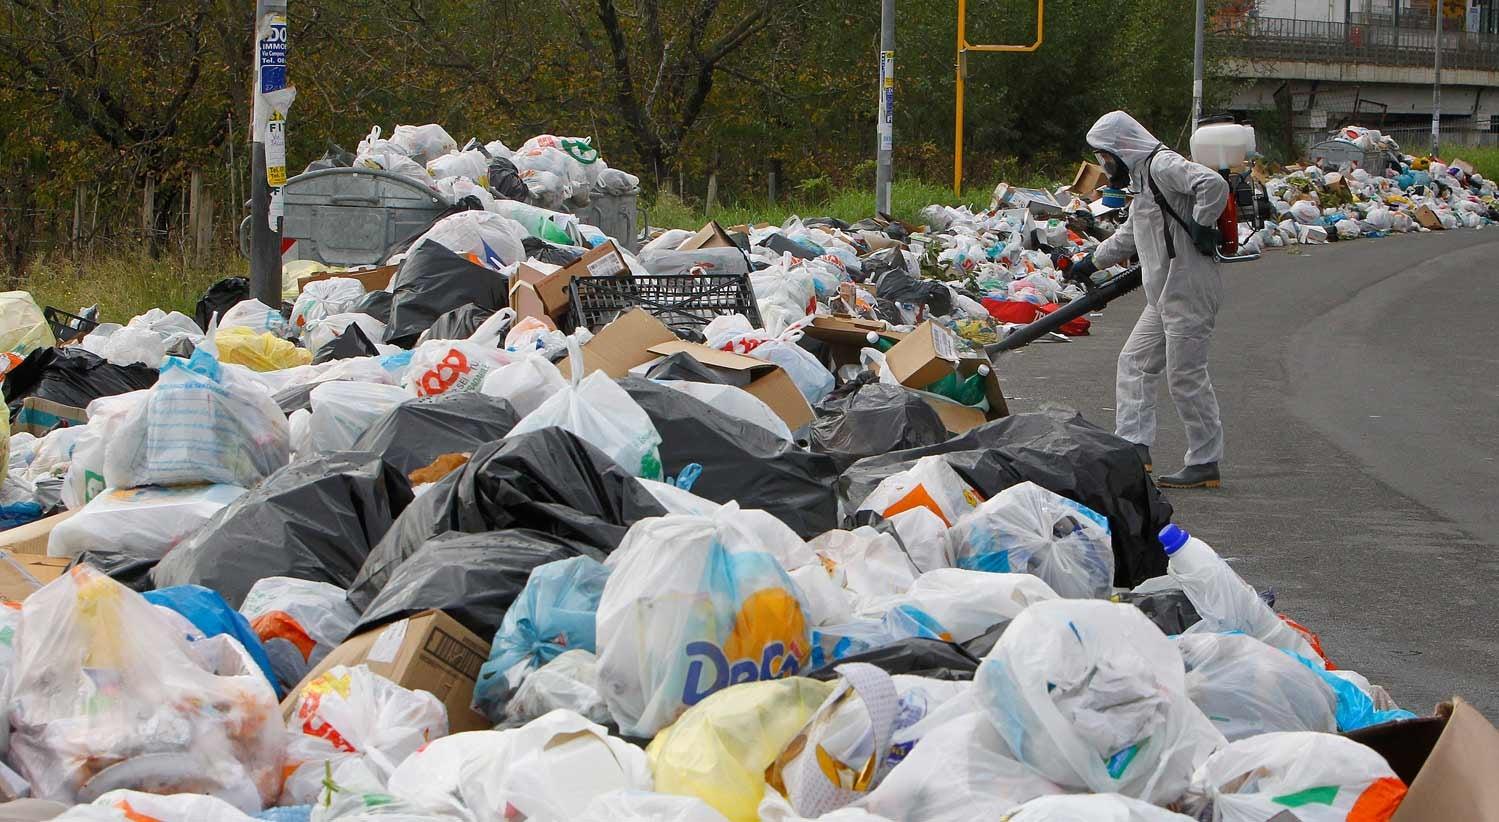 Lixo suspeito vindo de Itália chega a Portugal